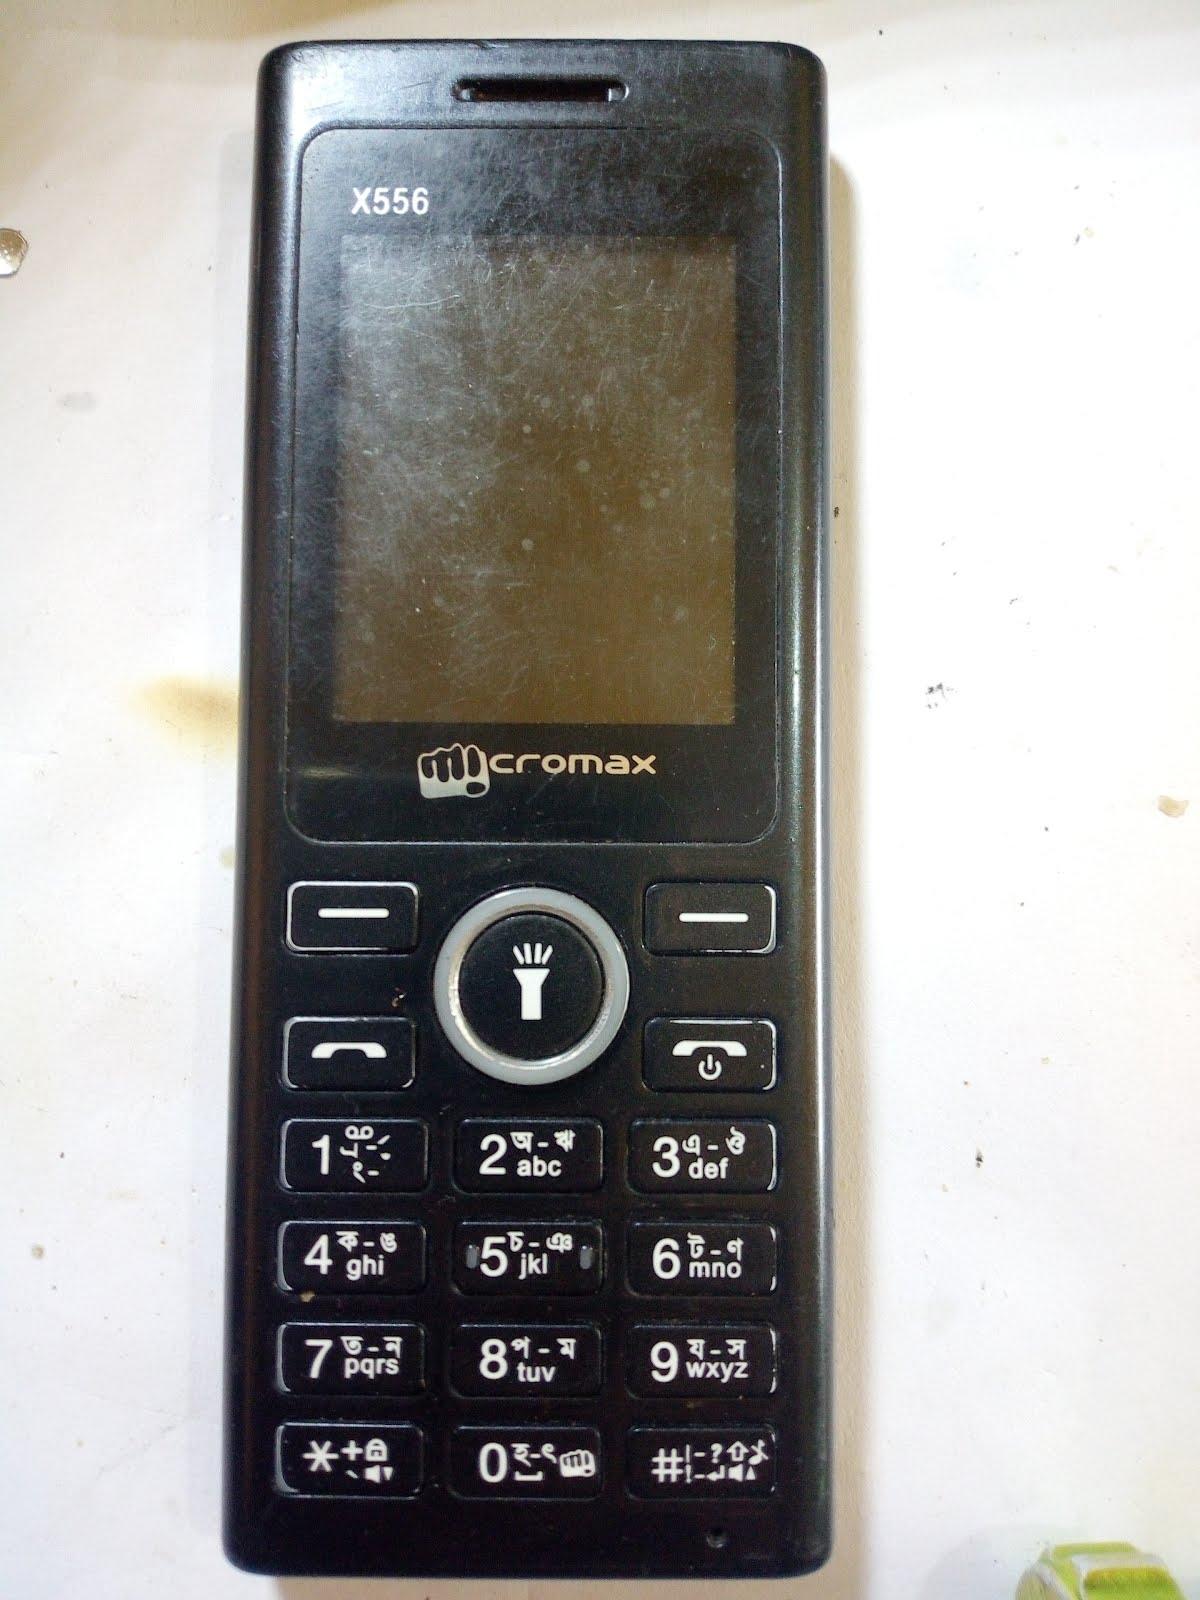 micromax X556 Firmware www.gsmnote.blogspot.com